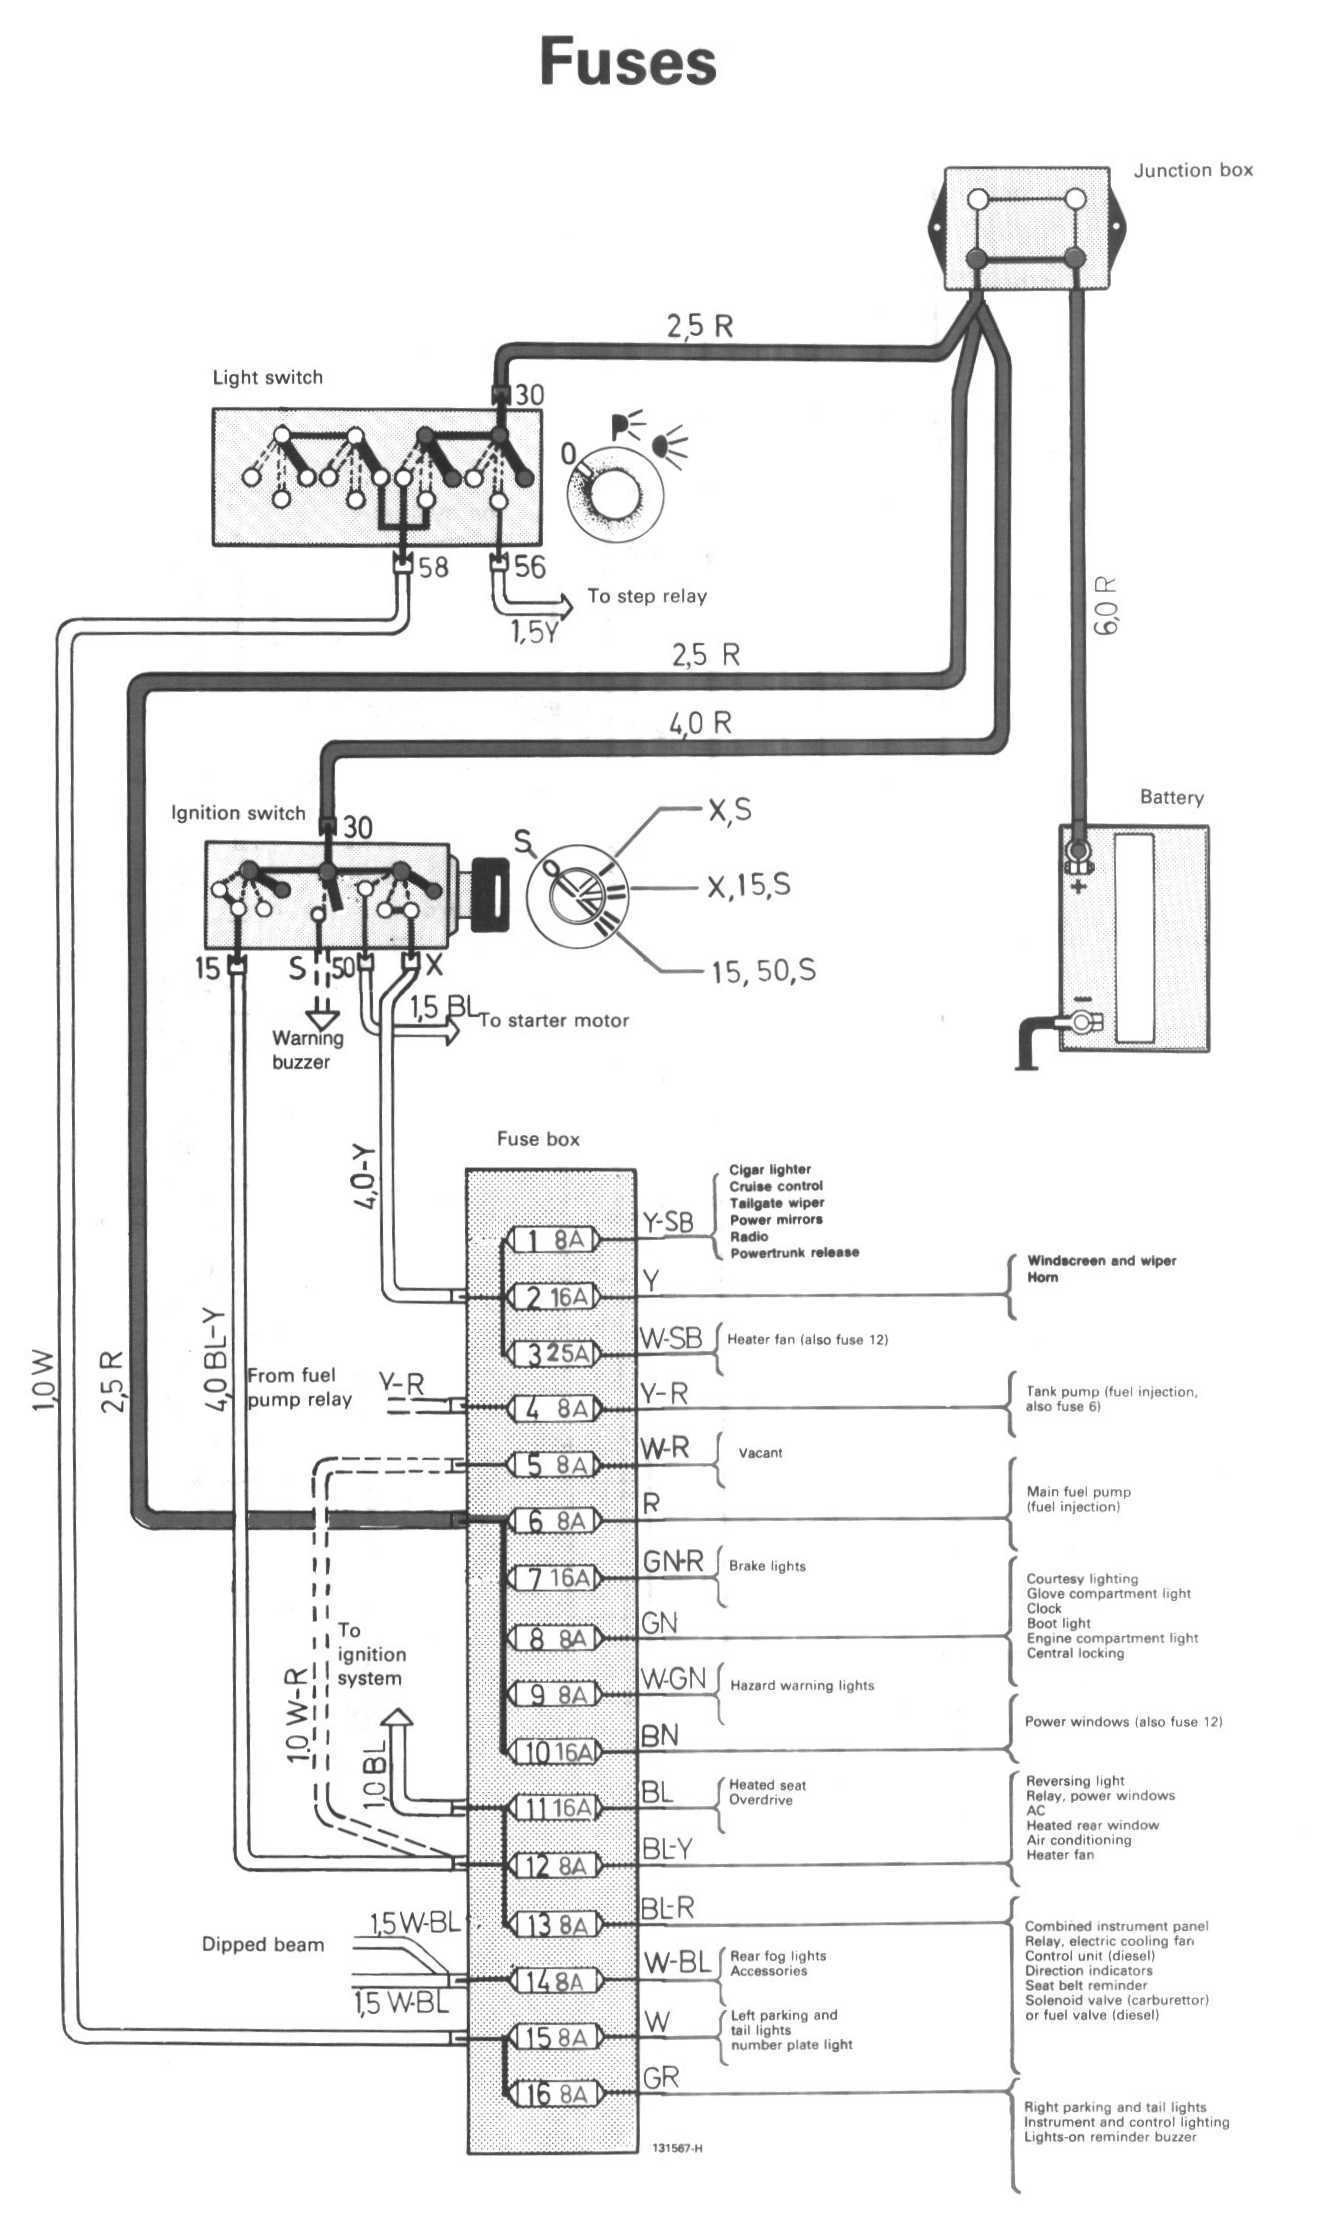 1991 volvo 240 radio wiring diagram create your own venn free fuse box location all data 740 we davidforlife de u2022 wiper switch